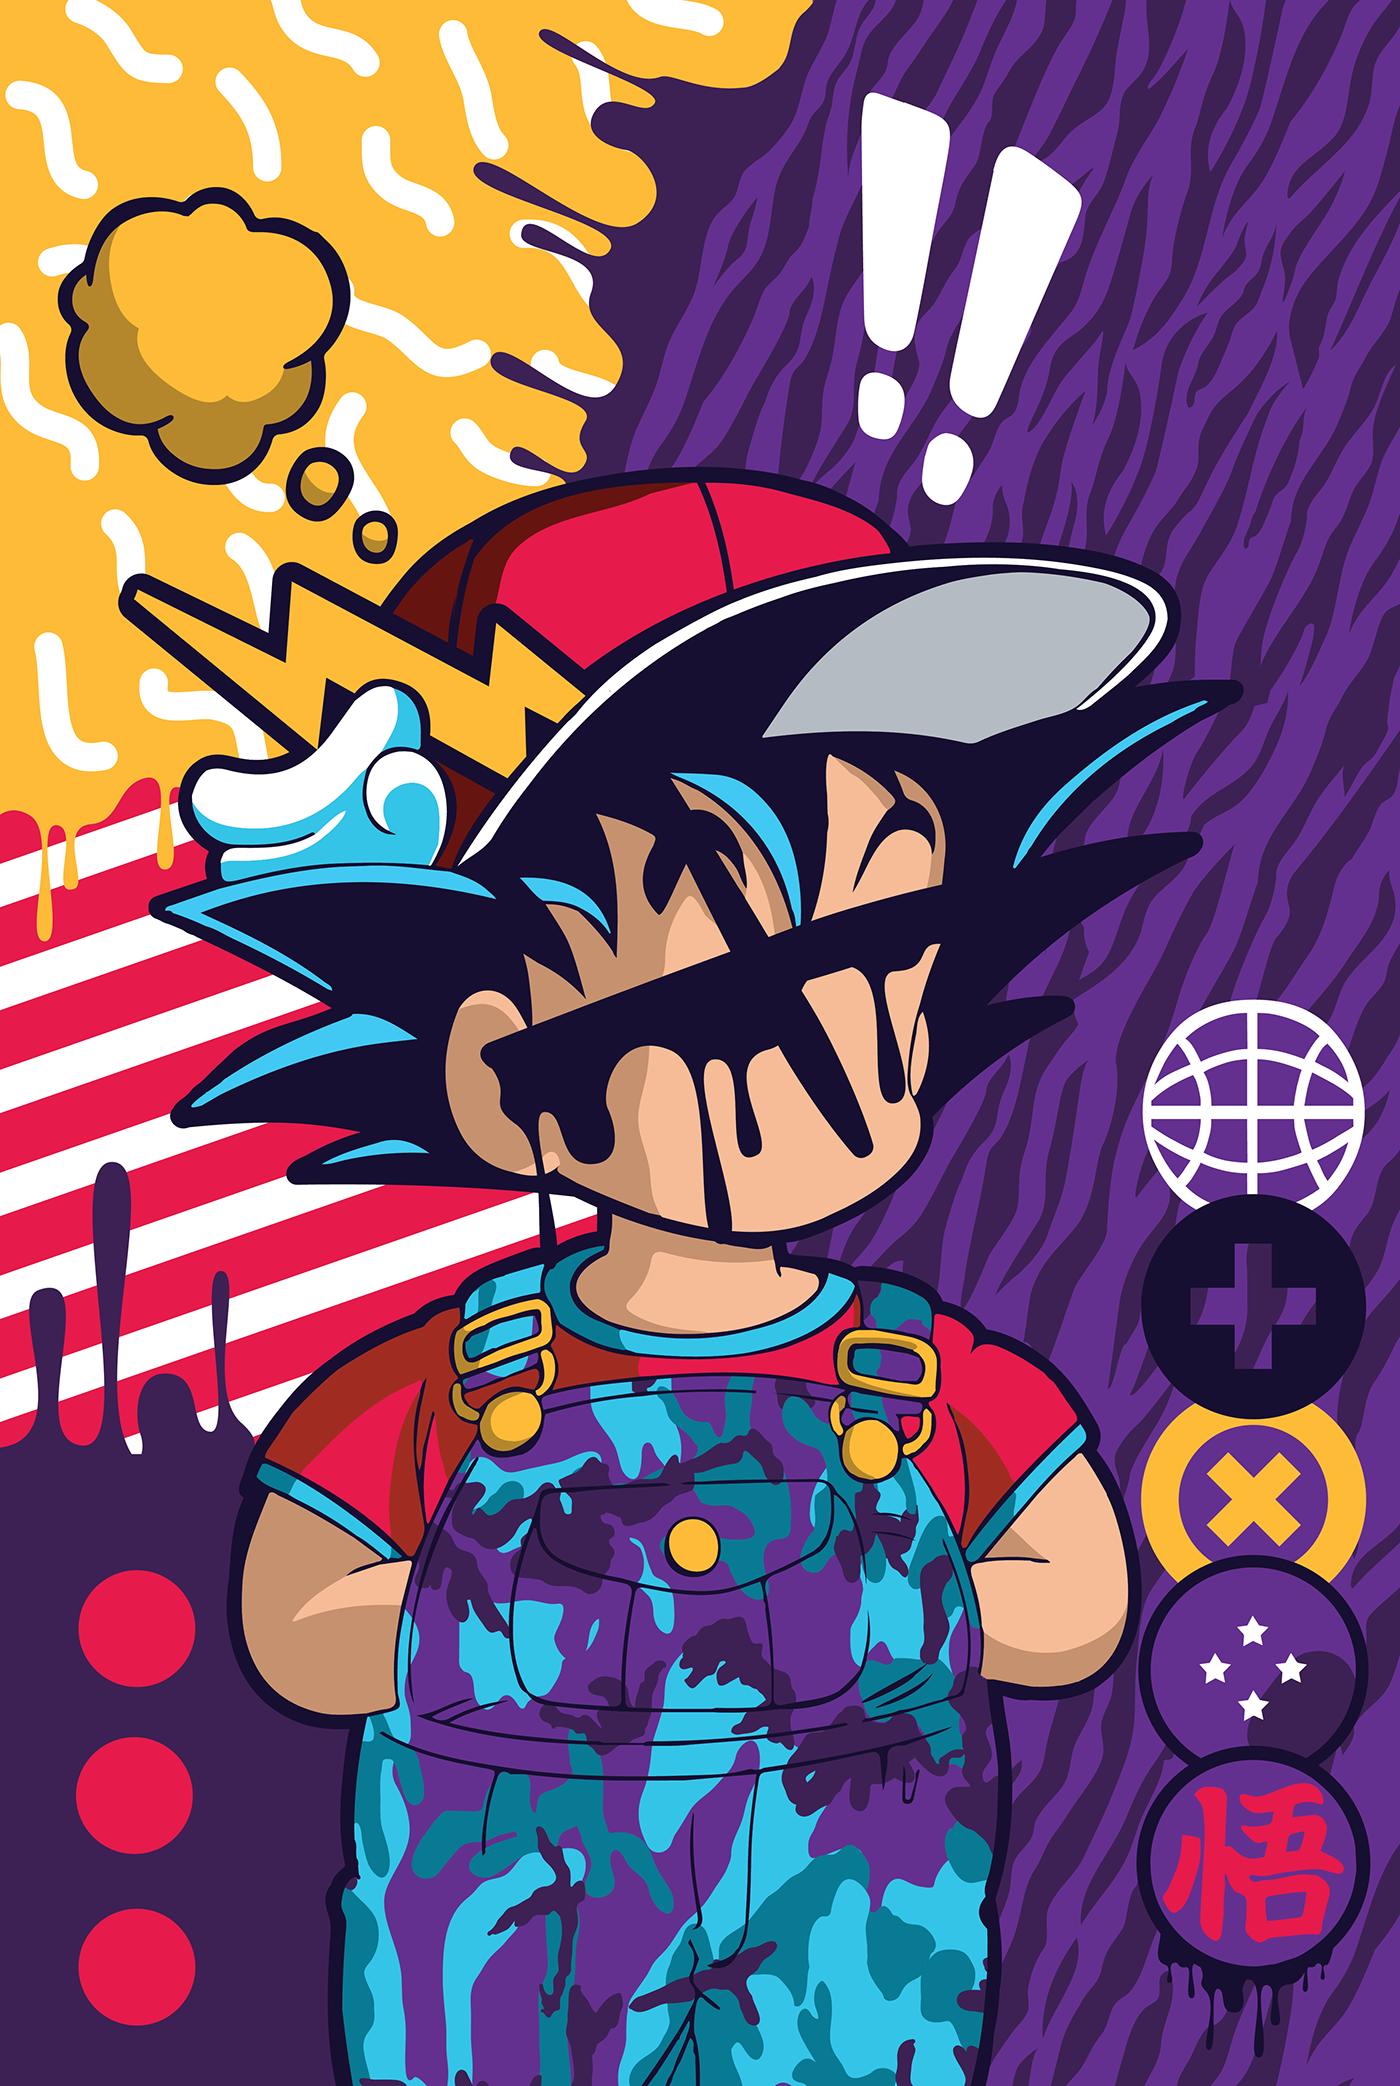 6ab9dbfaf3b5 DBZ PopArt - Illustration   Character Design on Behance